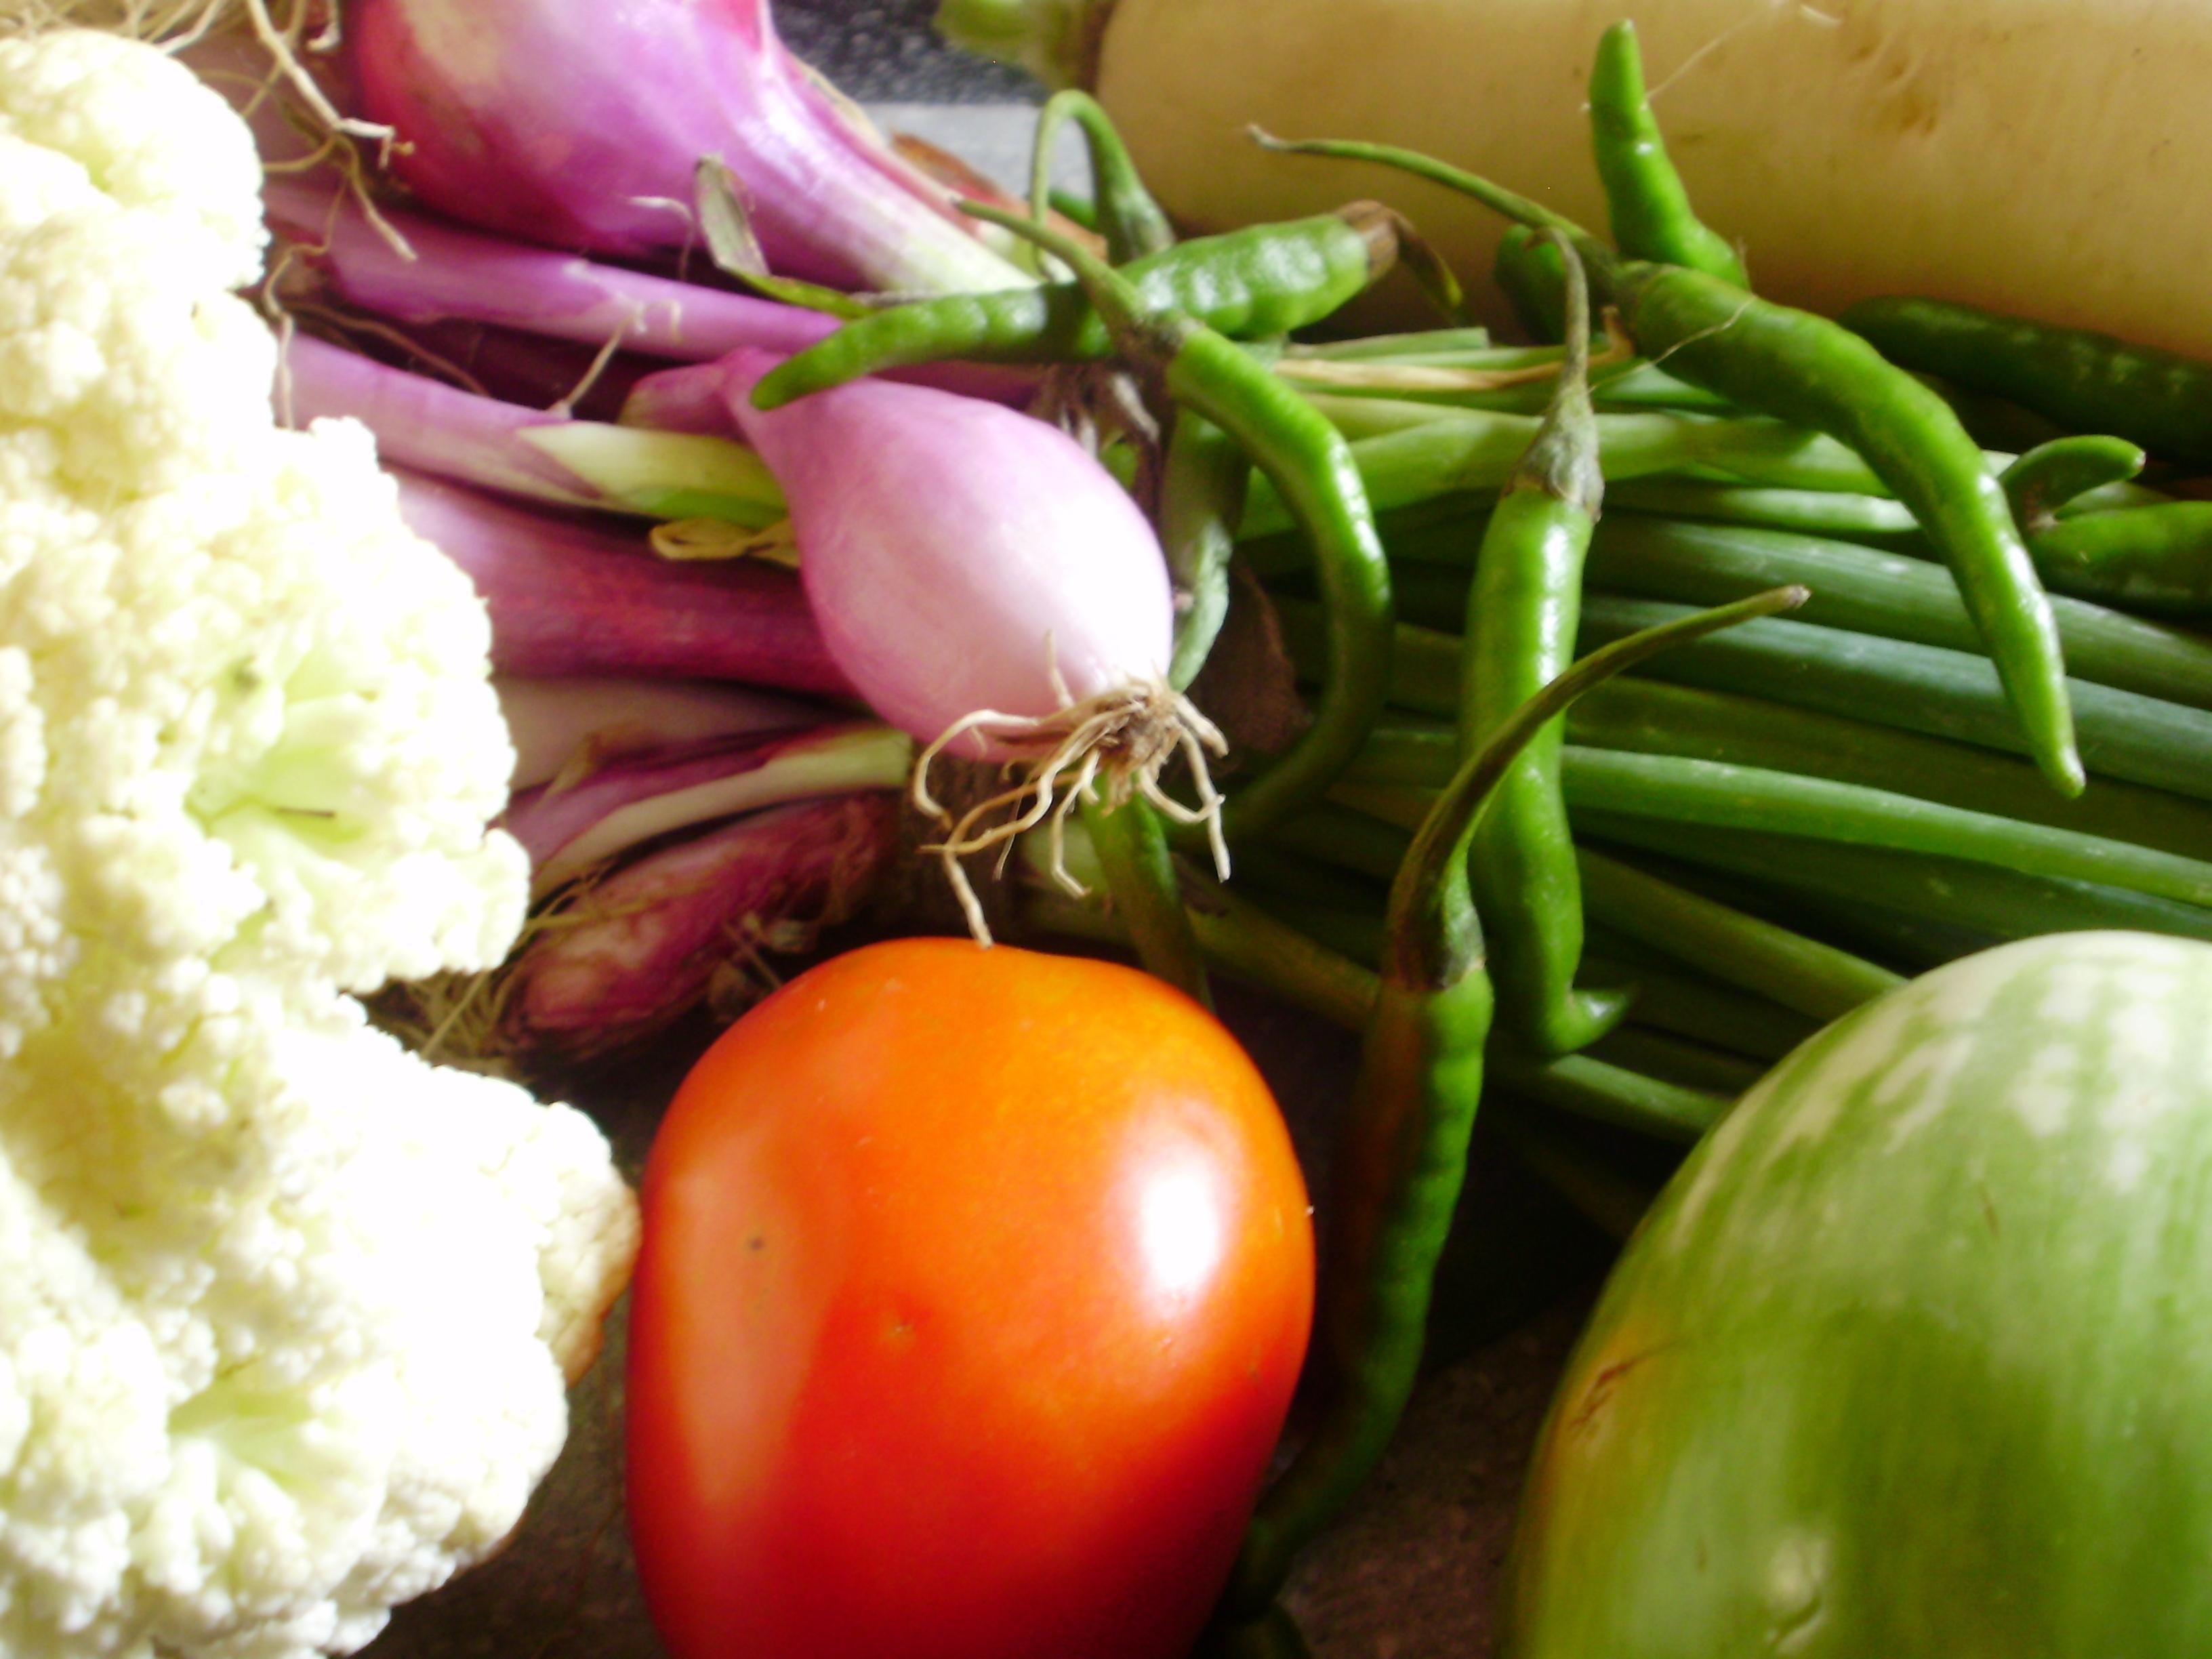 File:Hrushikesh Kulkarni Vegetables.JPG - Wikipedia